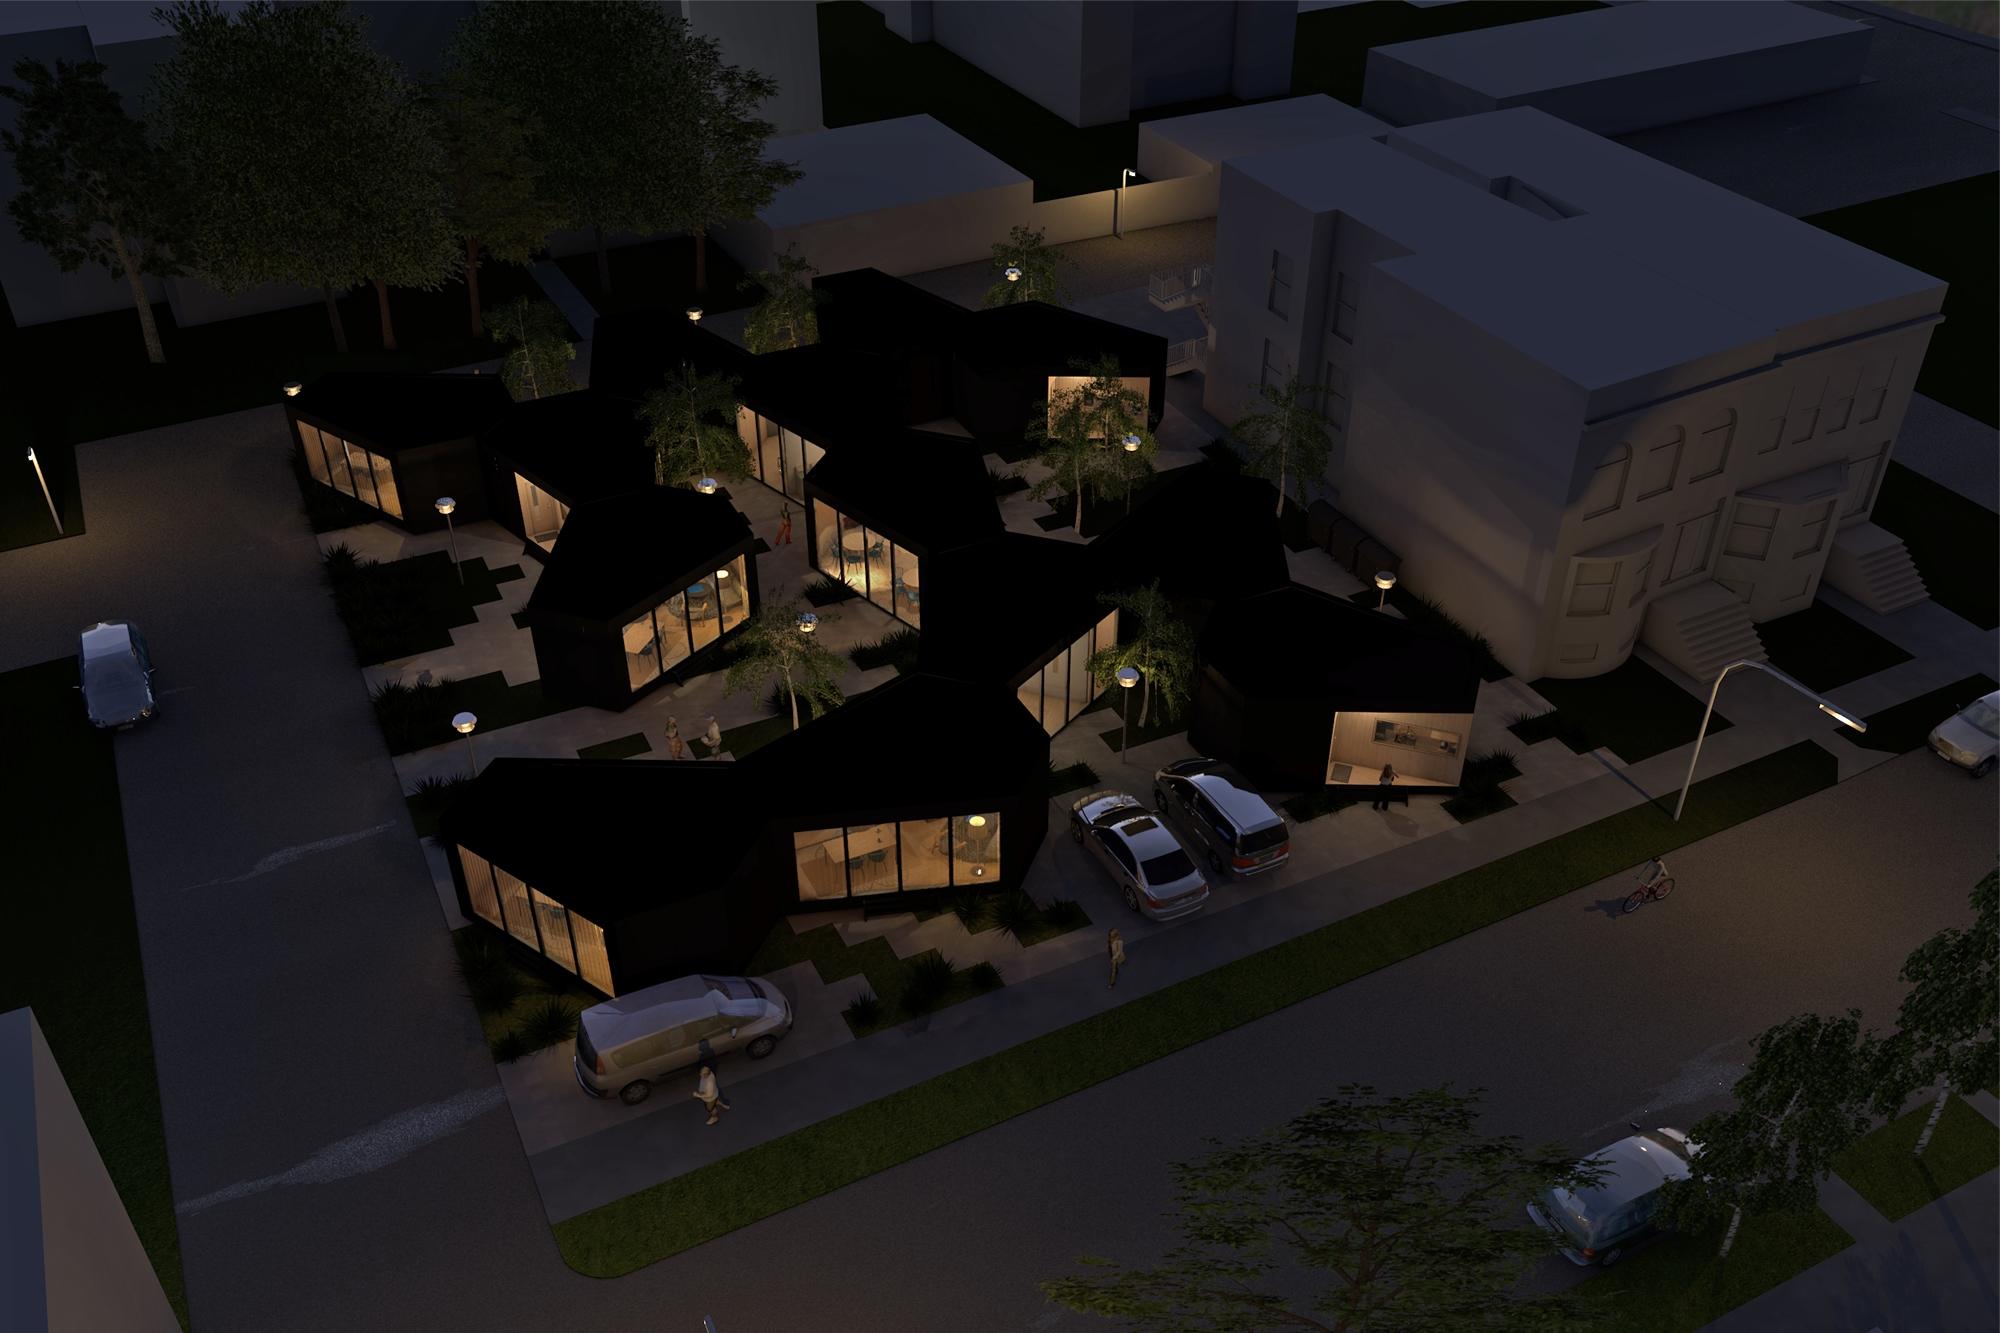 Architect kleine geschakelde woonvorm